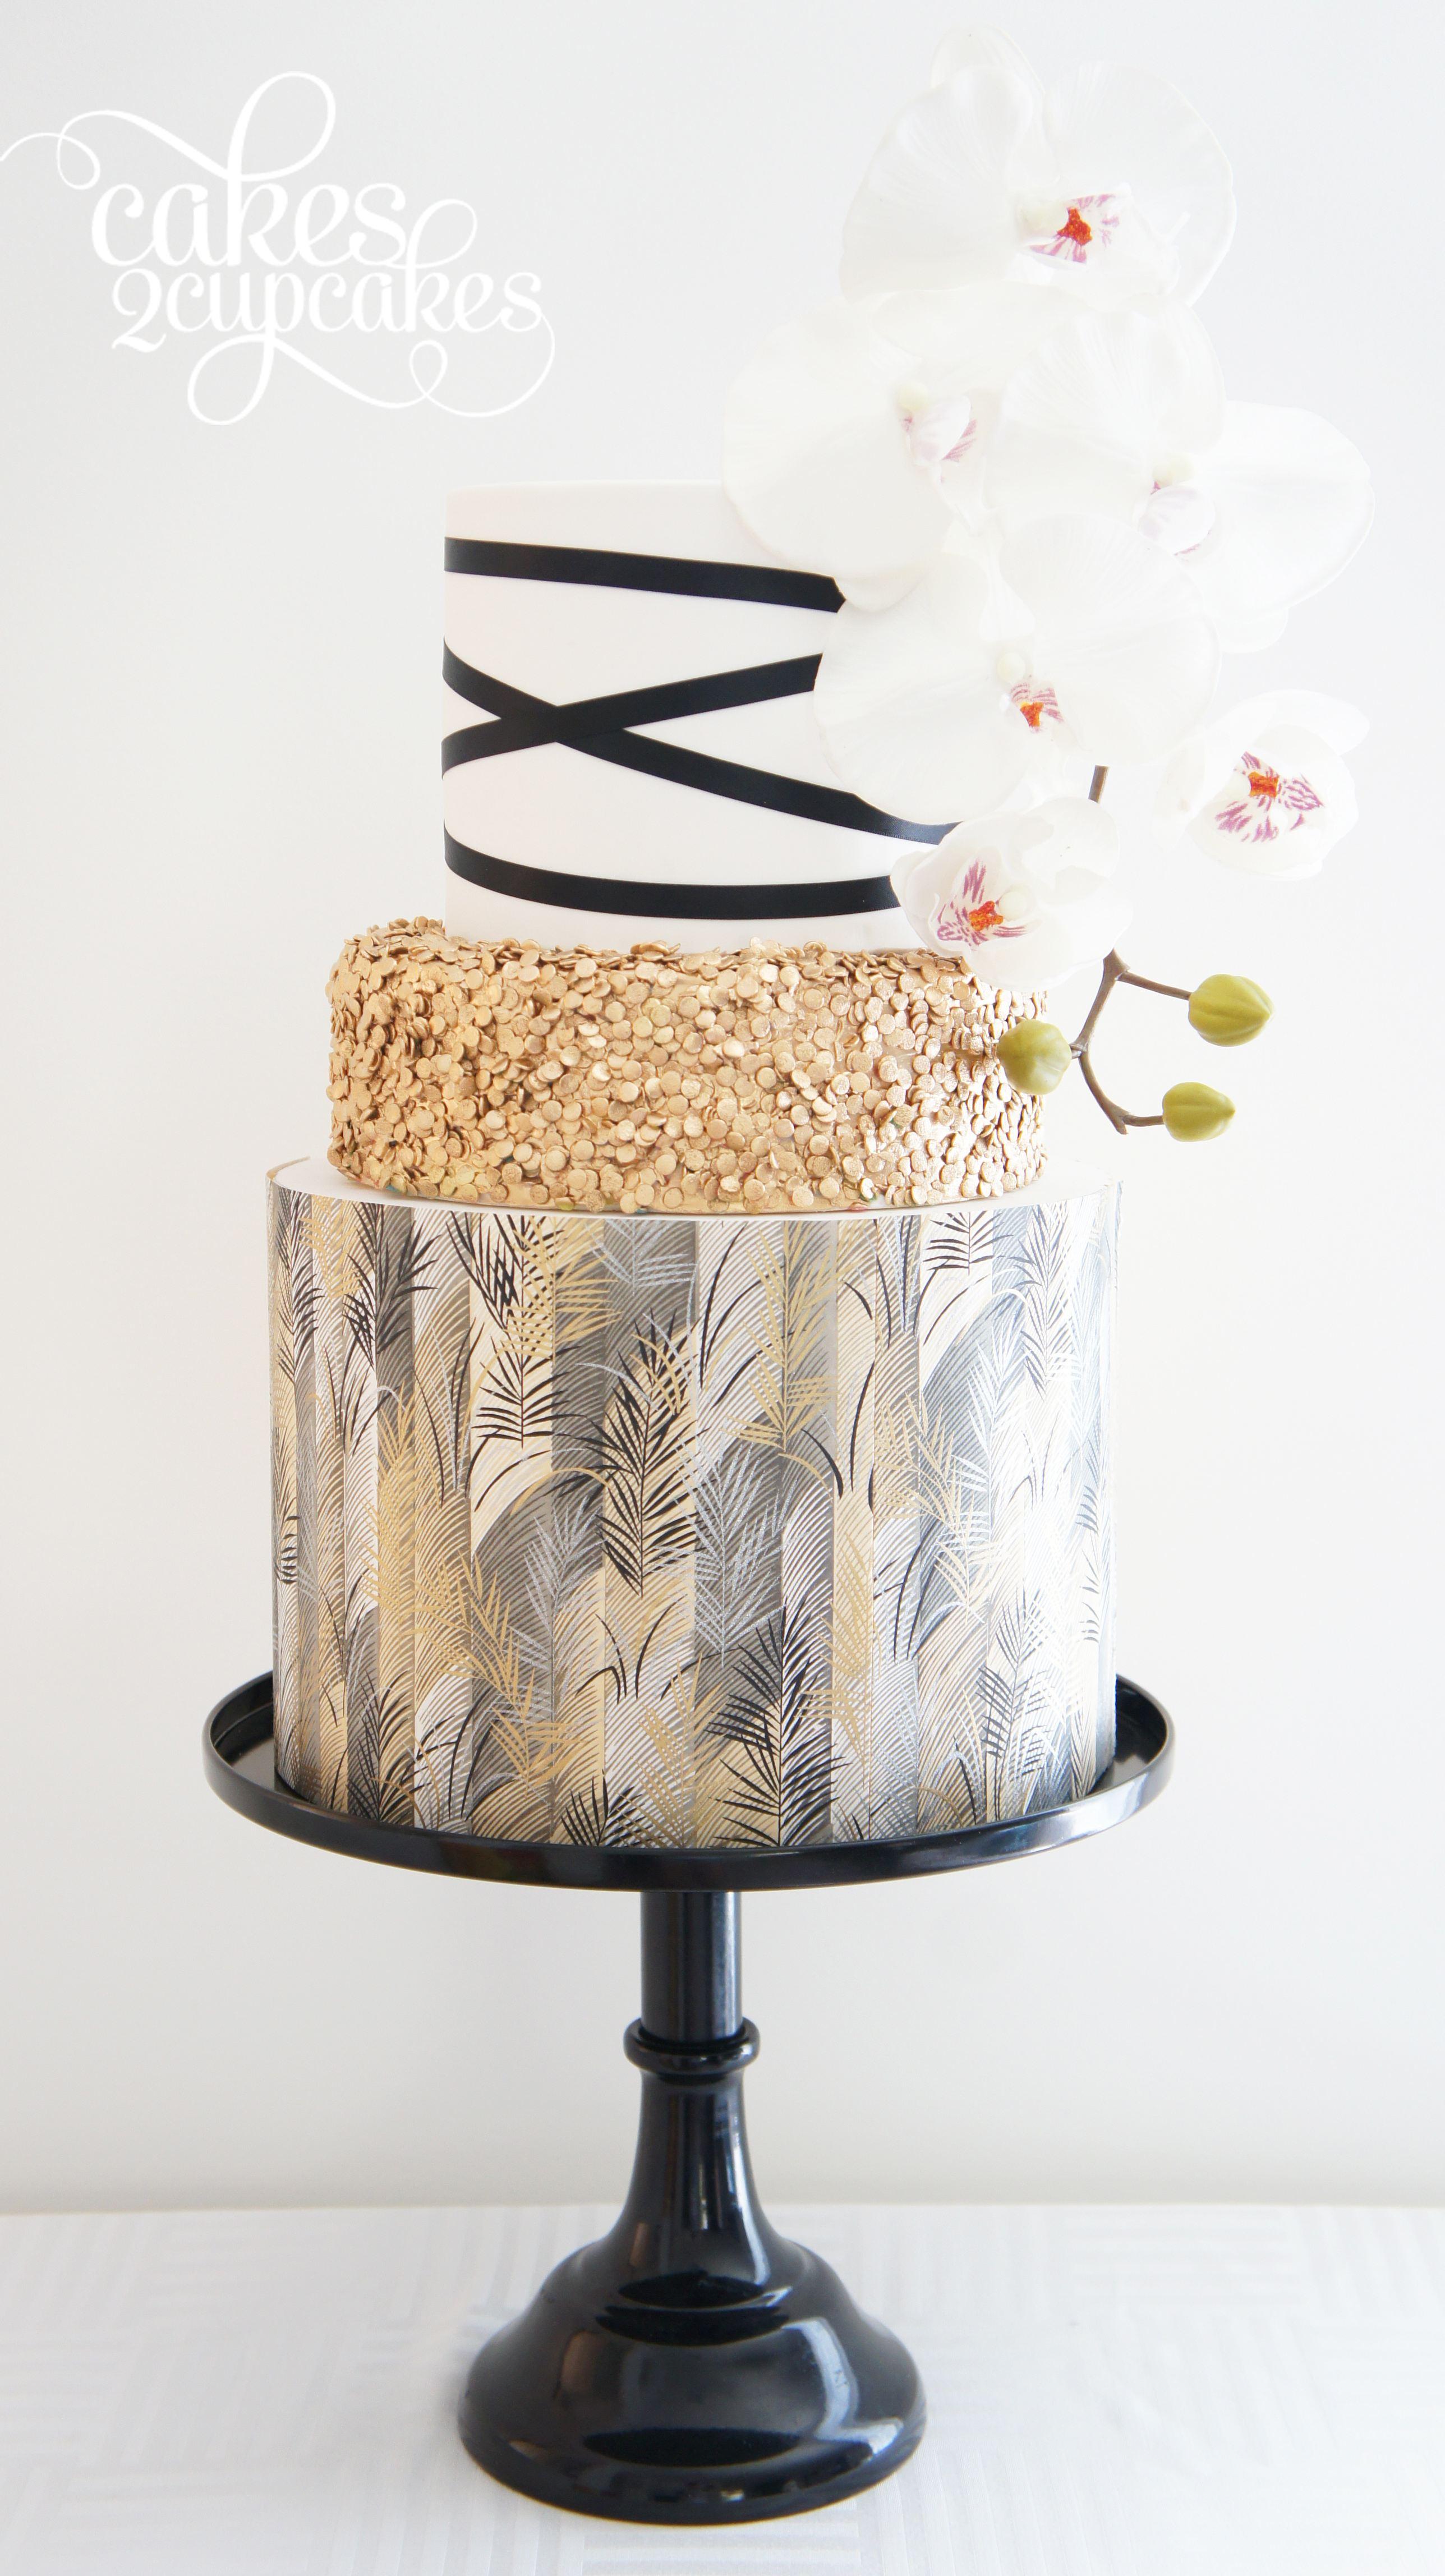 cakes2cupcakes-black-gold.jpg